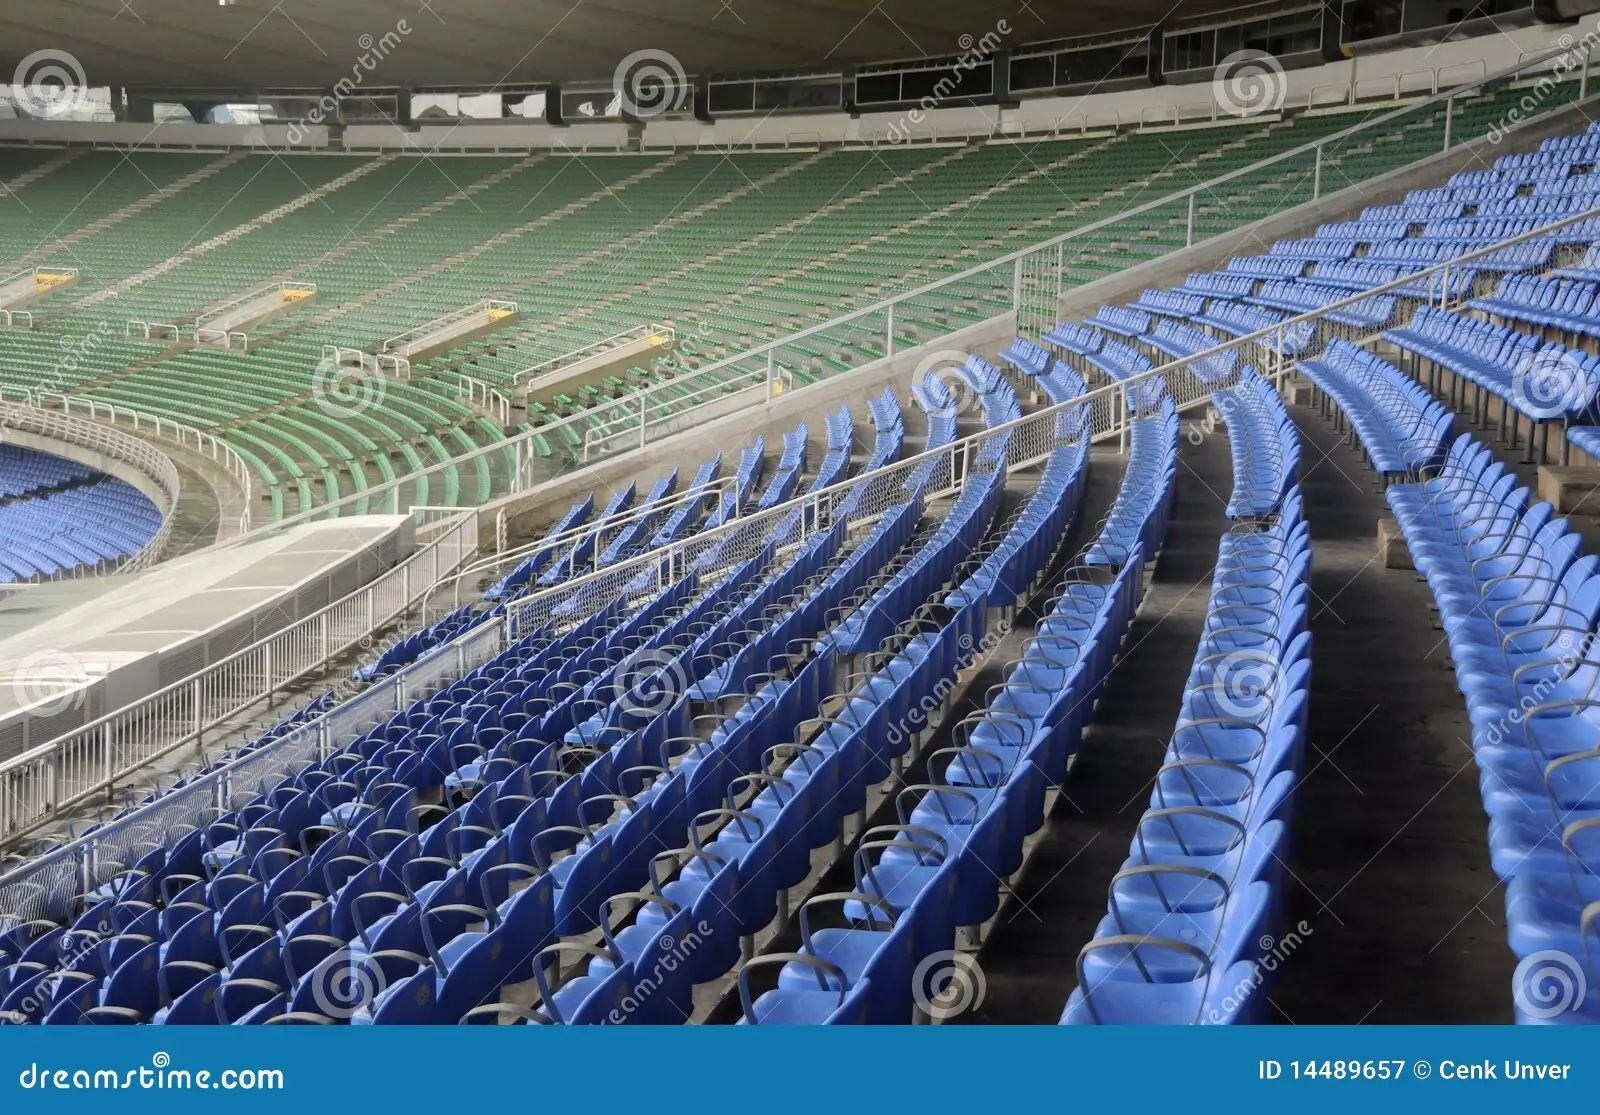 empty color stadium seats at maracana football stadium in rio de janeiro brazil editorial image